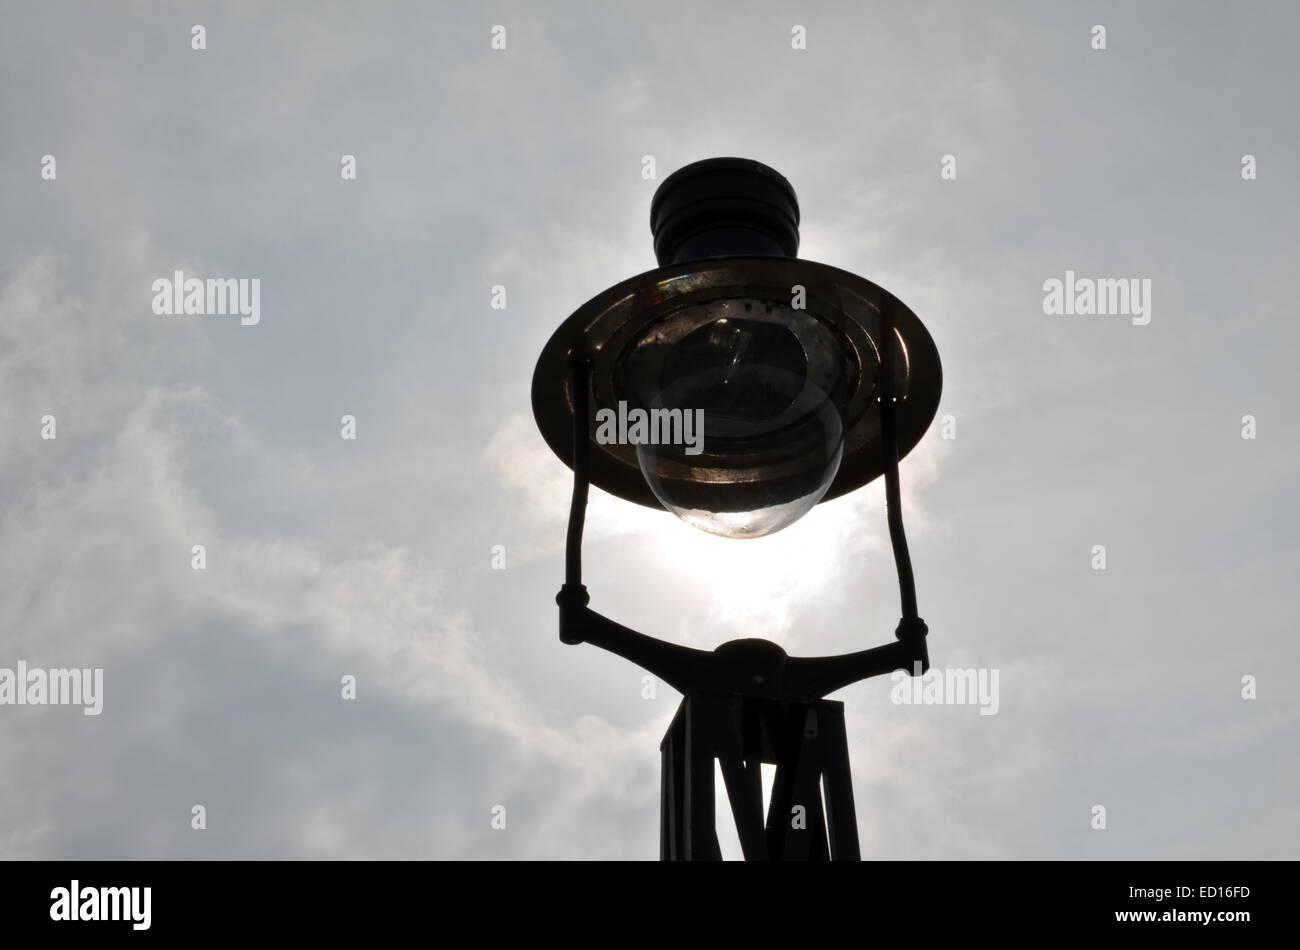 Lamp on a bridge in Dumbarton - Stock Image